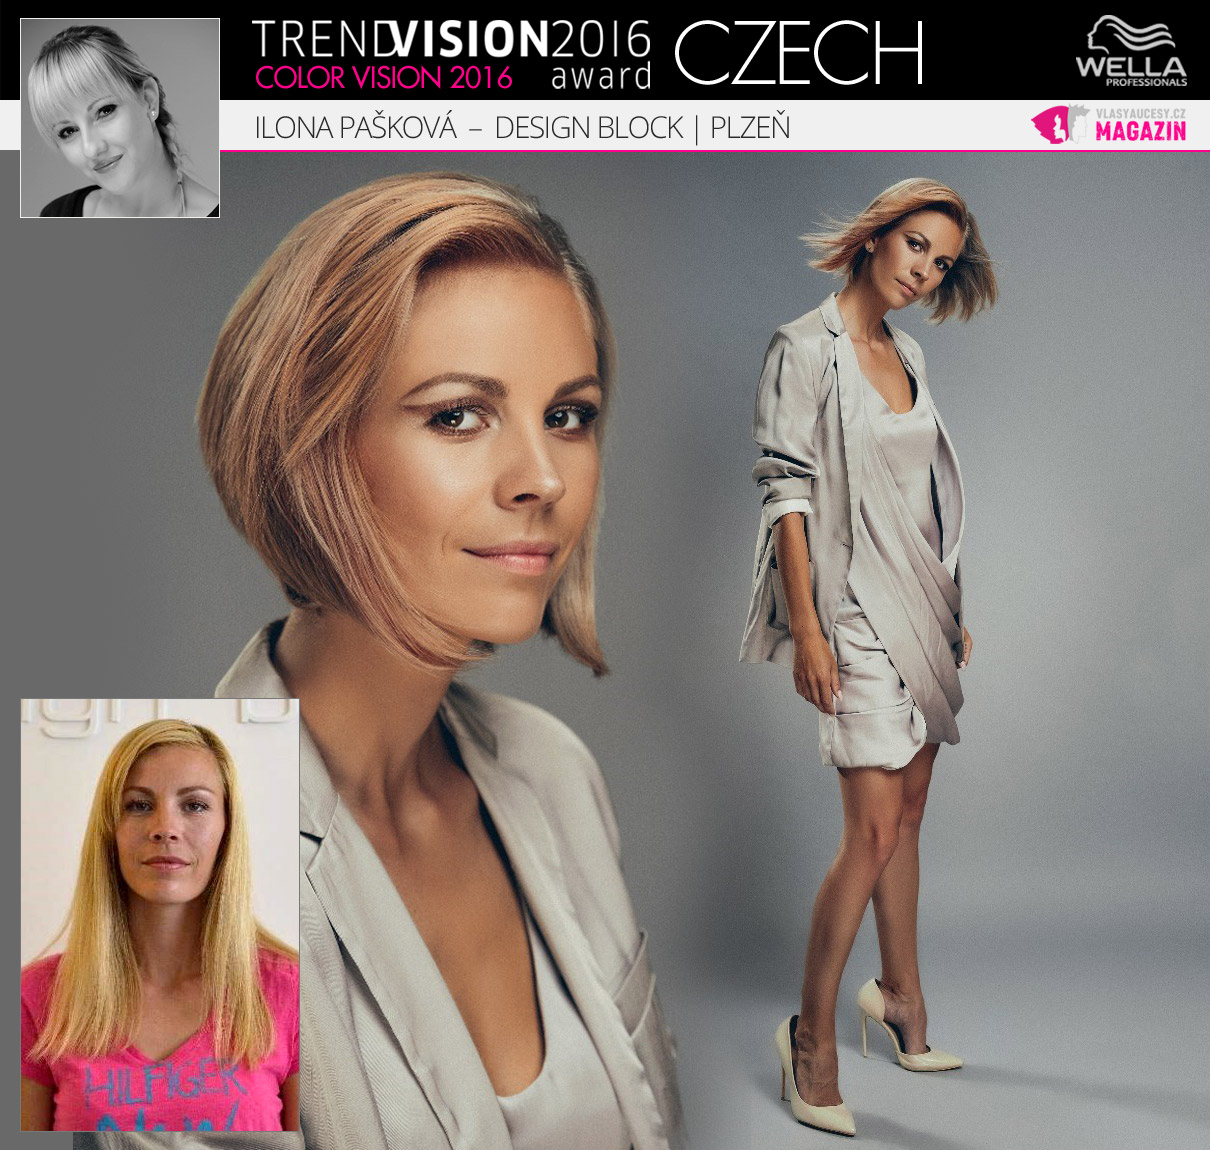 Ilona Pašková, Design Block, Plzeň –Wella Professionals Trend Vision Award Česká republika, kategorie Color Vision 2016.